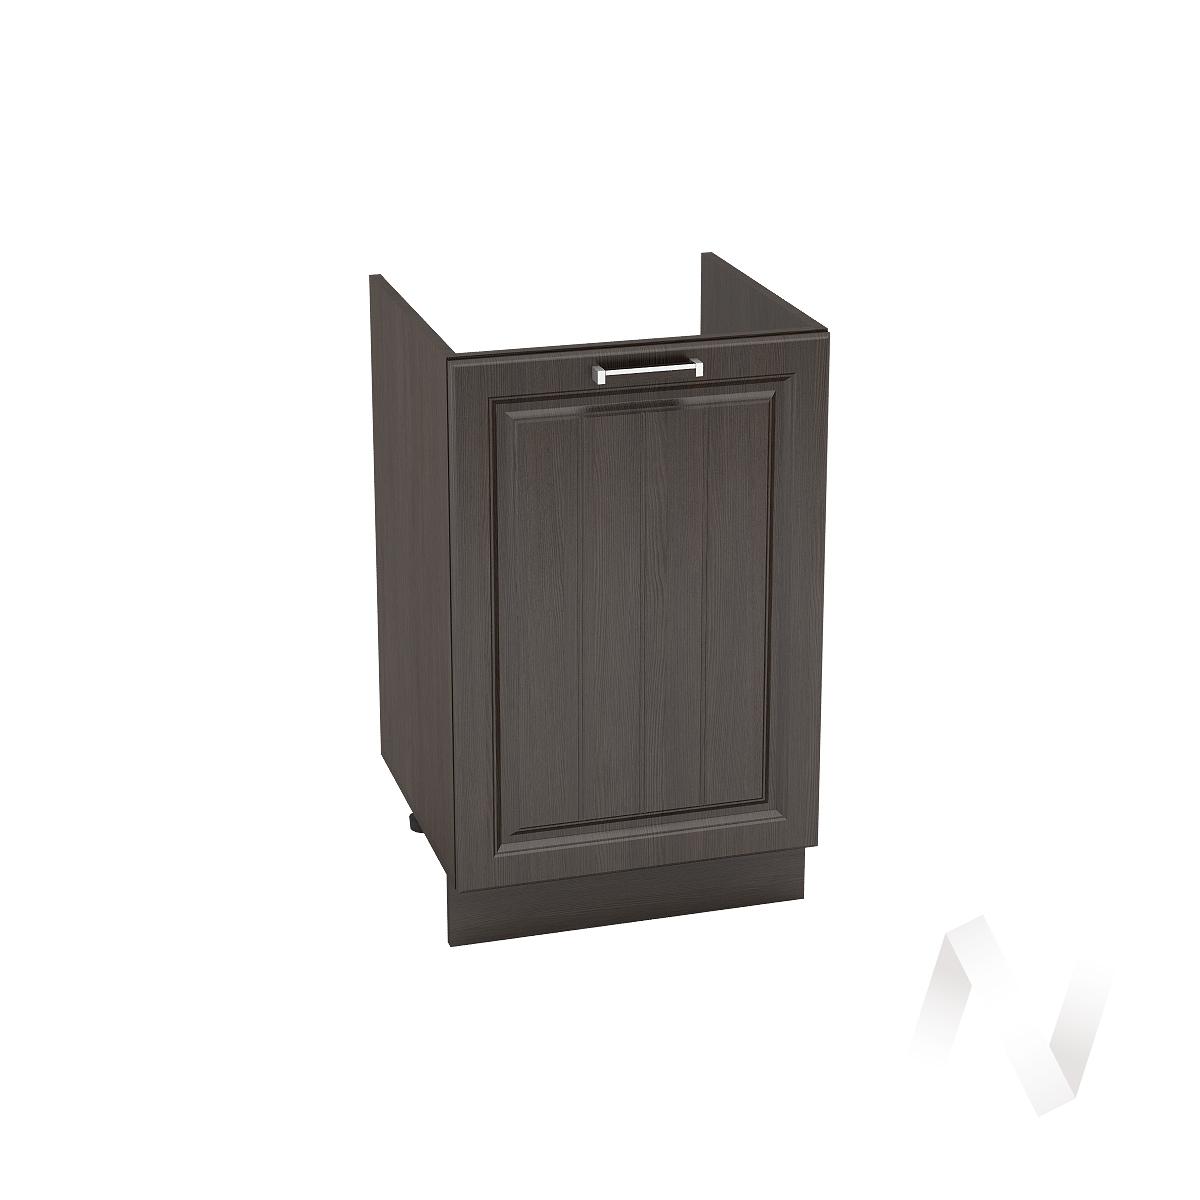 "Кухня ""Прага"": Шкаф нижний под мойку 500, ШНМ 500 (венге/корпус венге)"